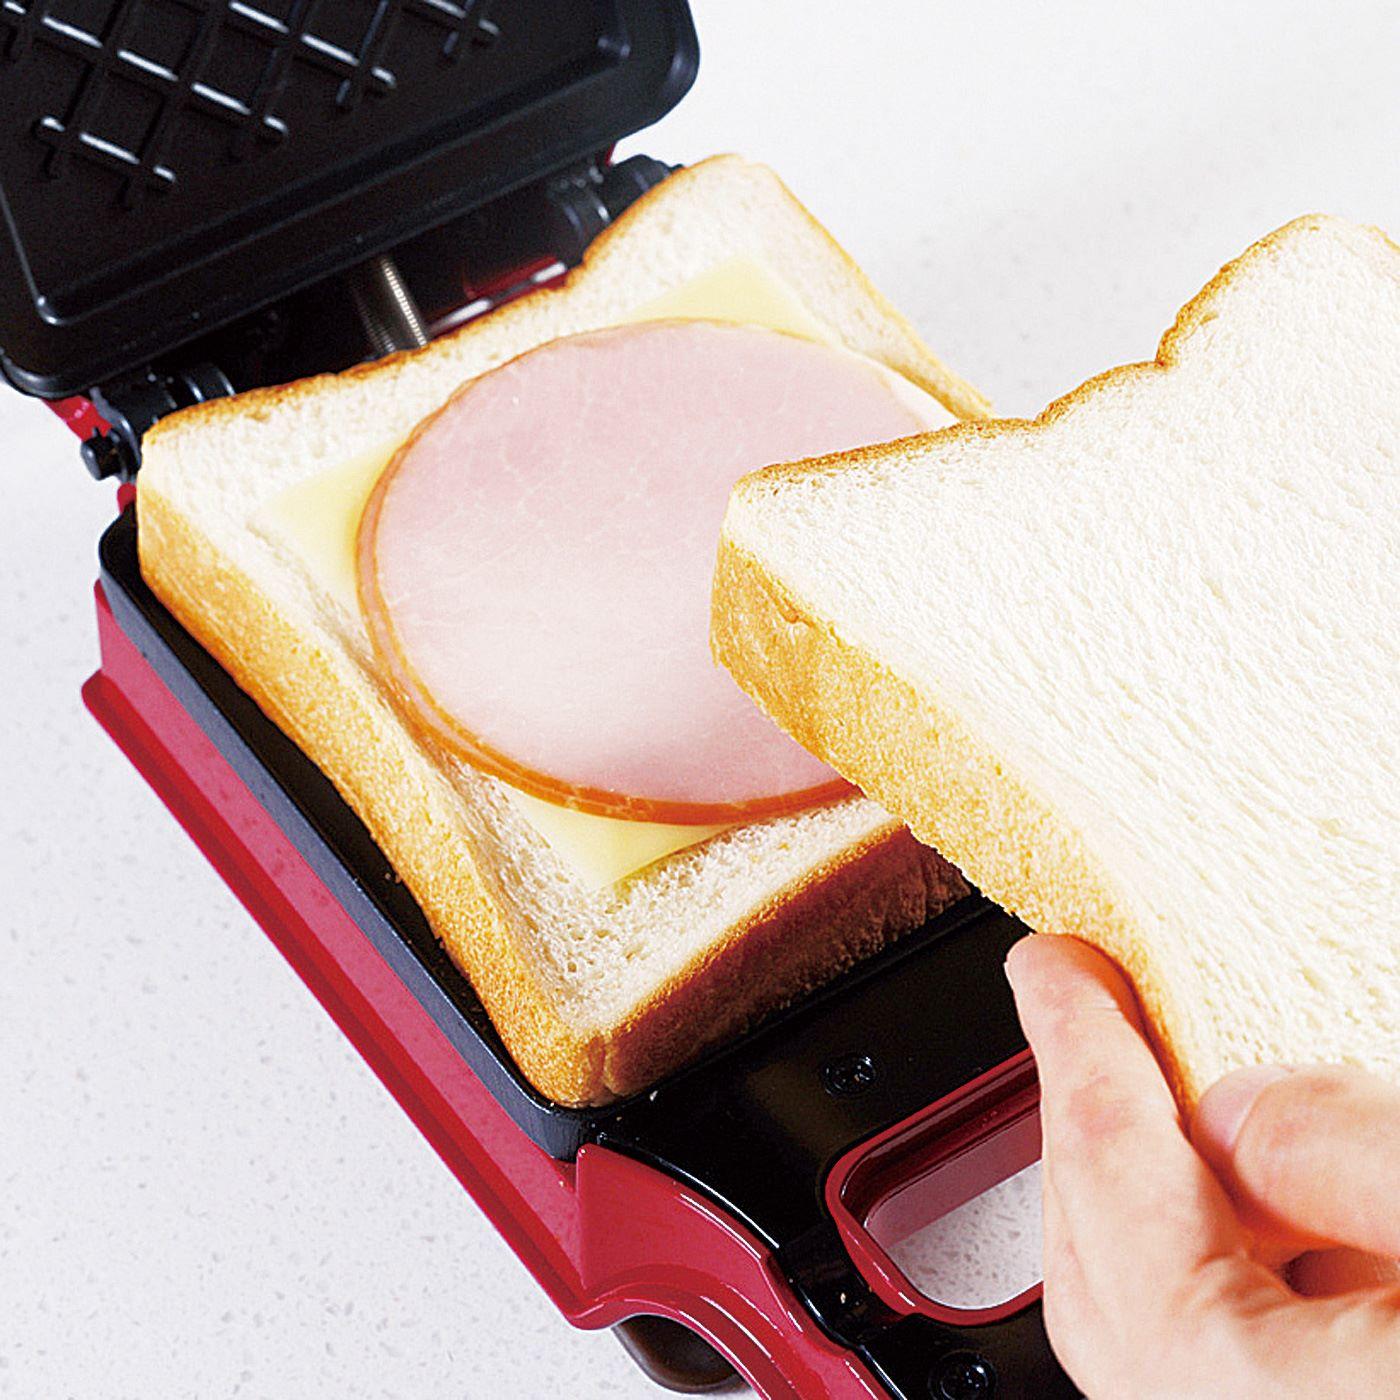 HOW TO COOK ①耳付きパンの上にハムやチーズなどお好みの具材をのせます。